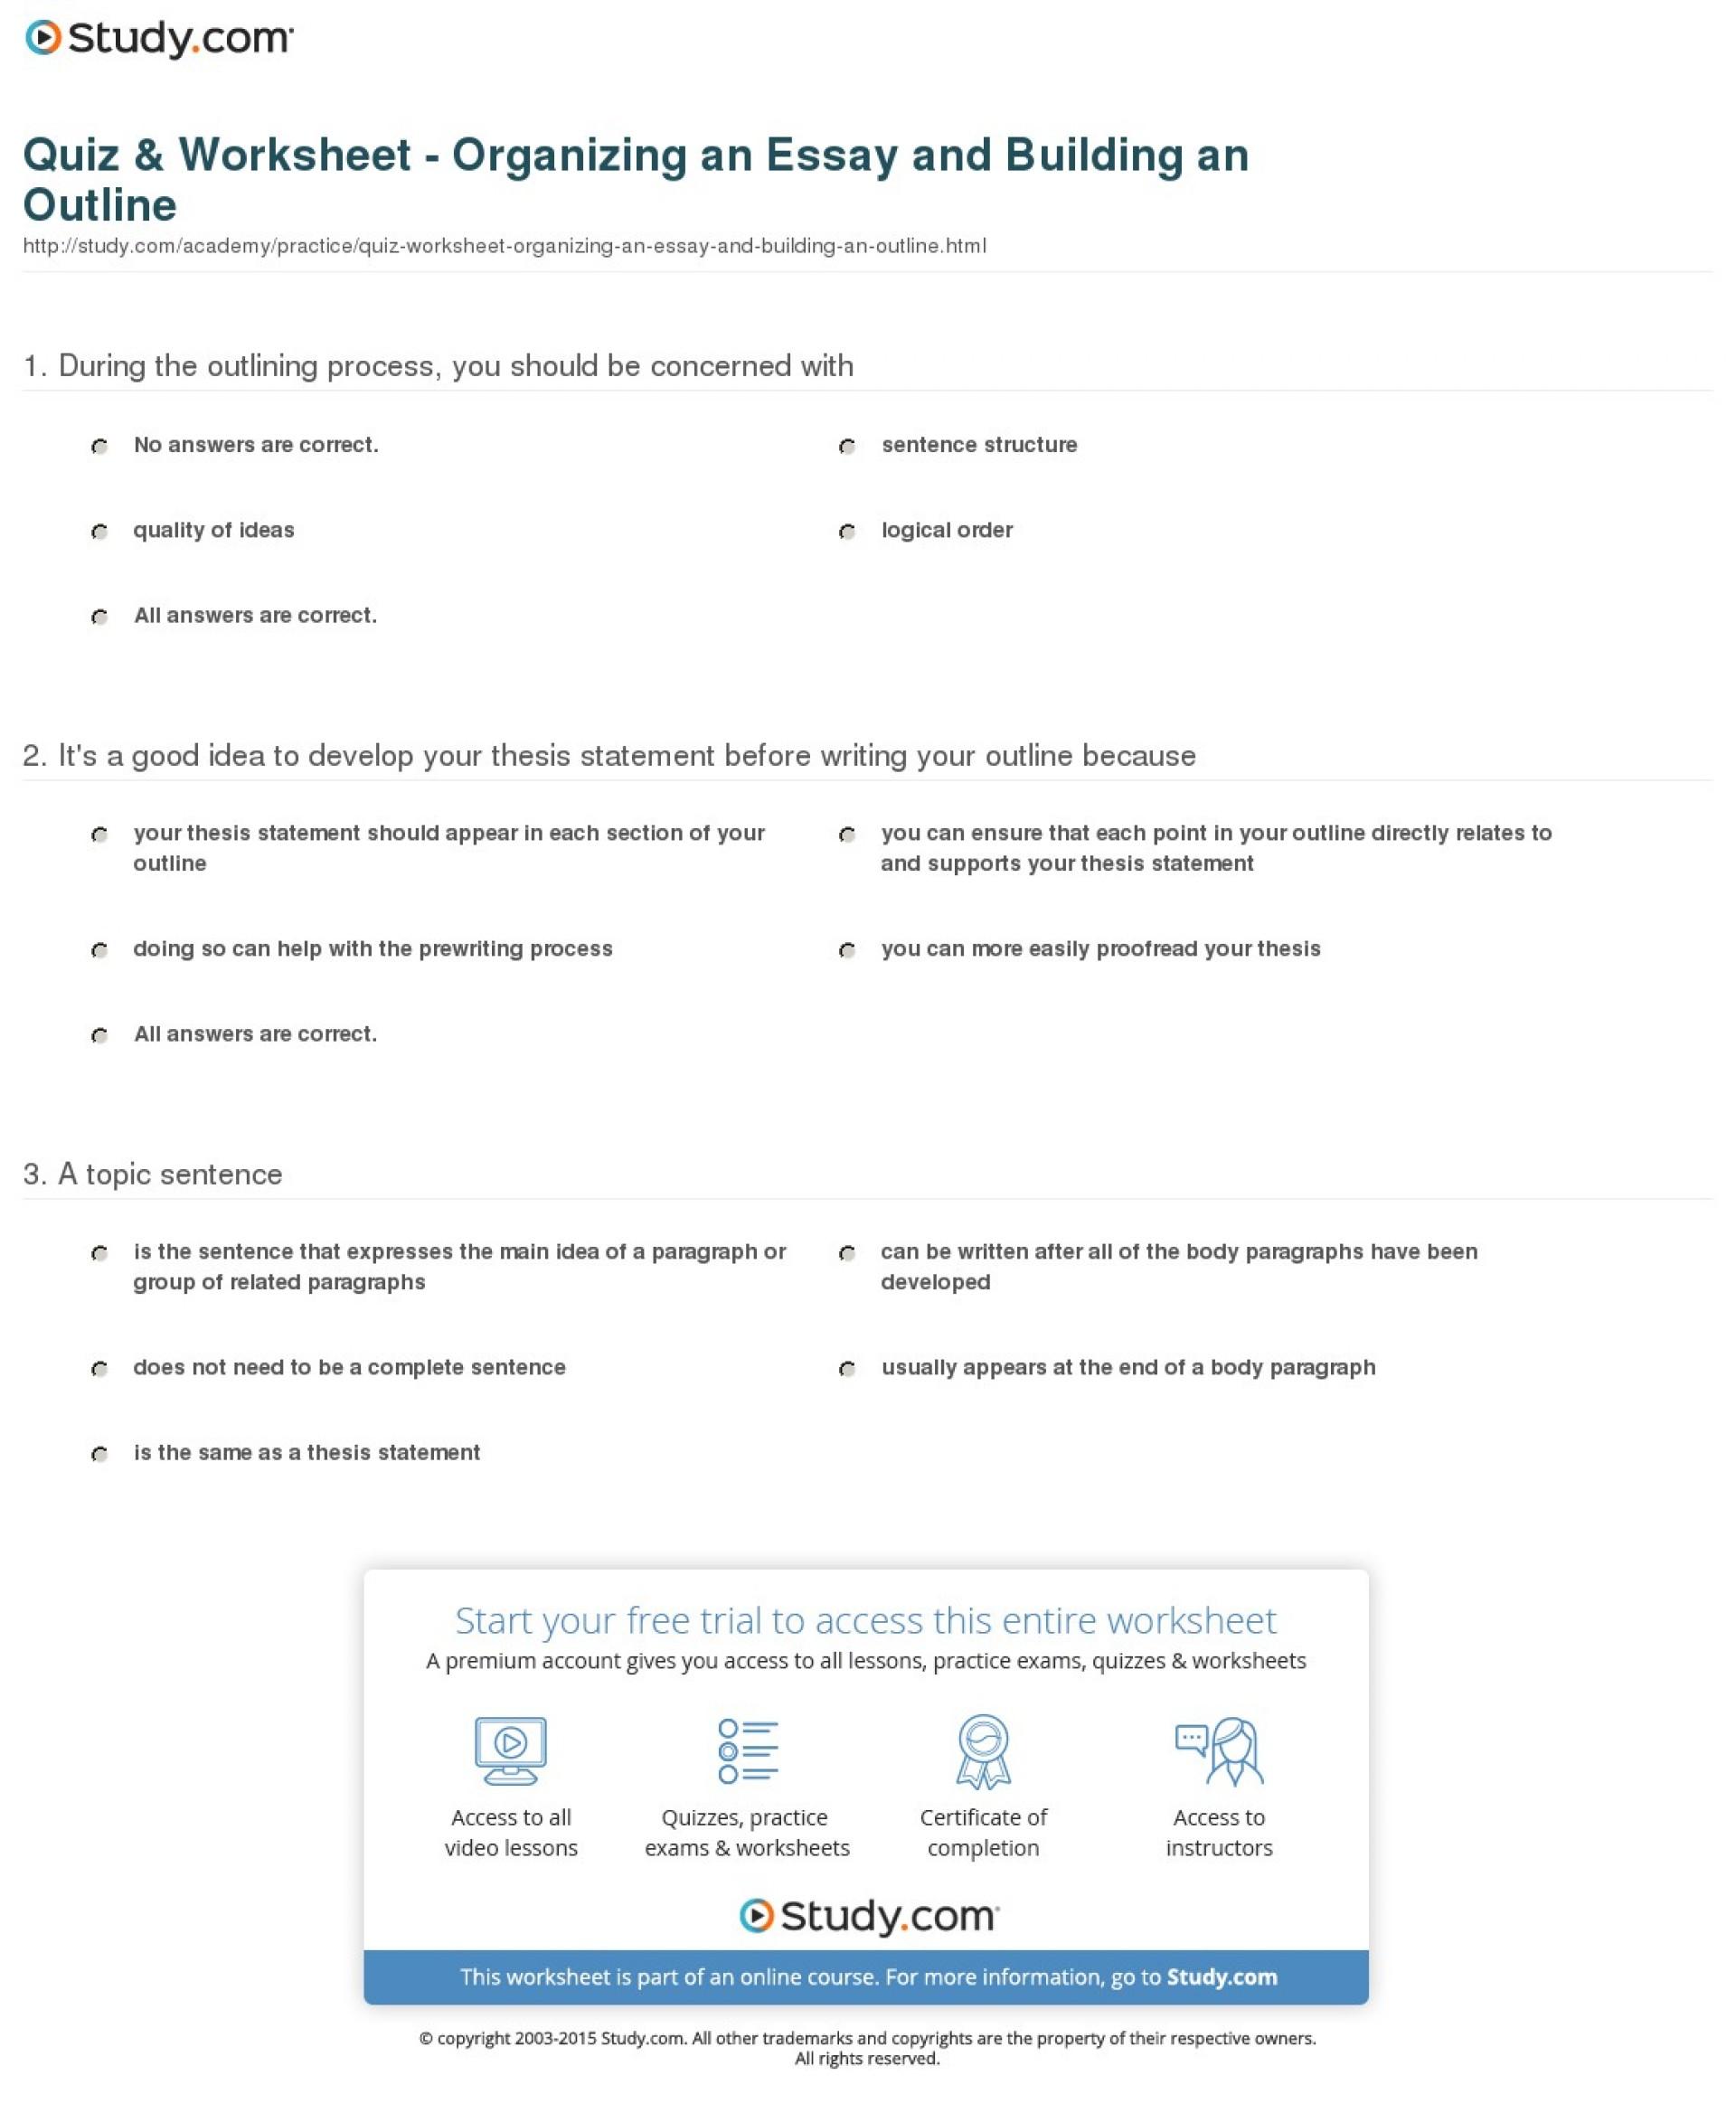 017 Essay Example Outline Of Quiz Worksheet Organizing An And Impressive Argumentative Sample Mla Format 1920